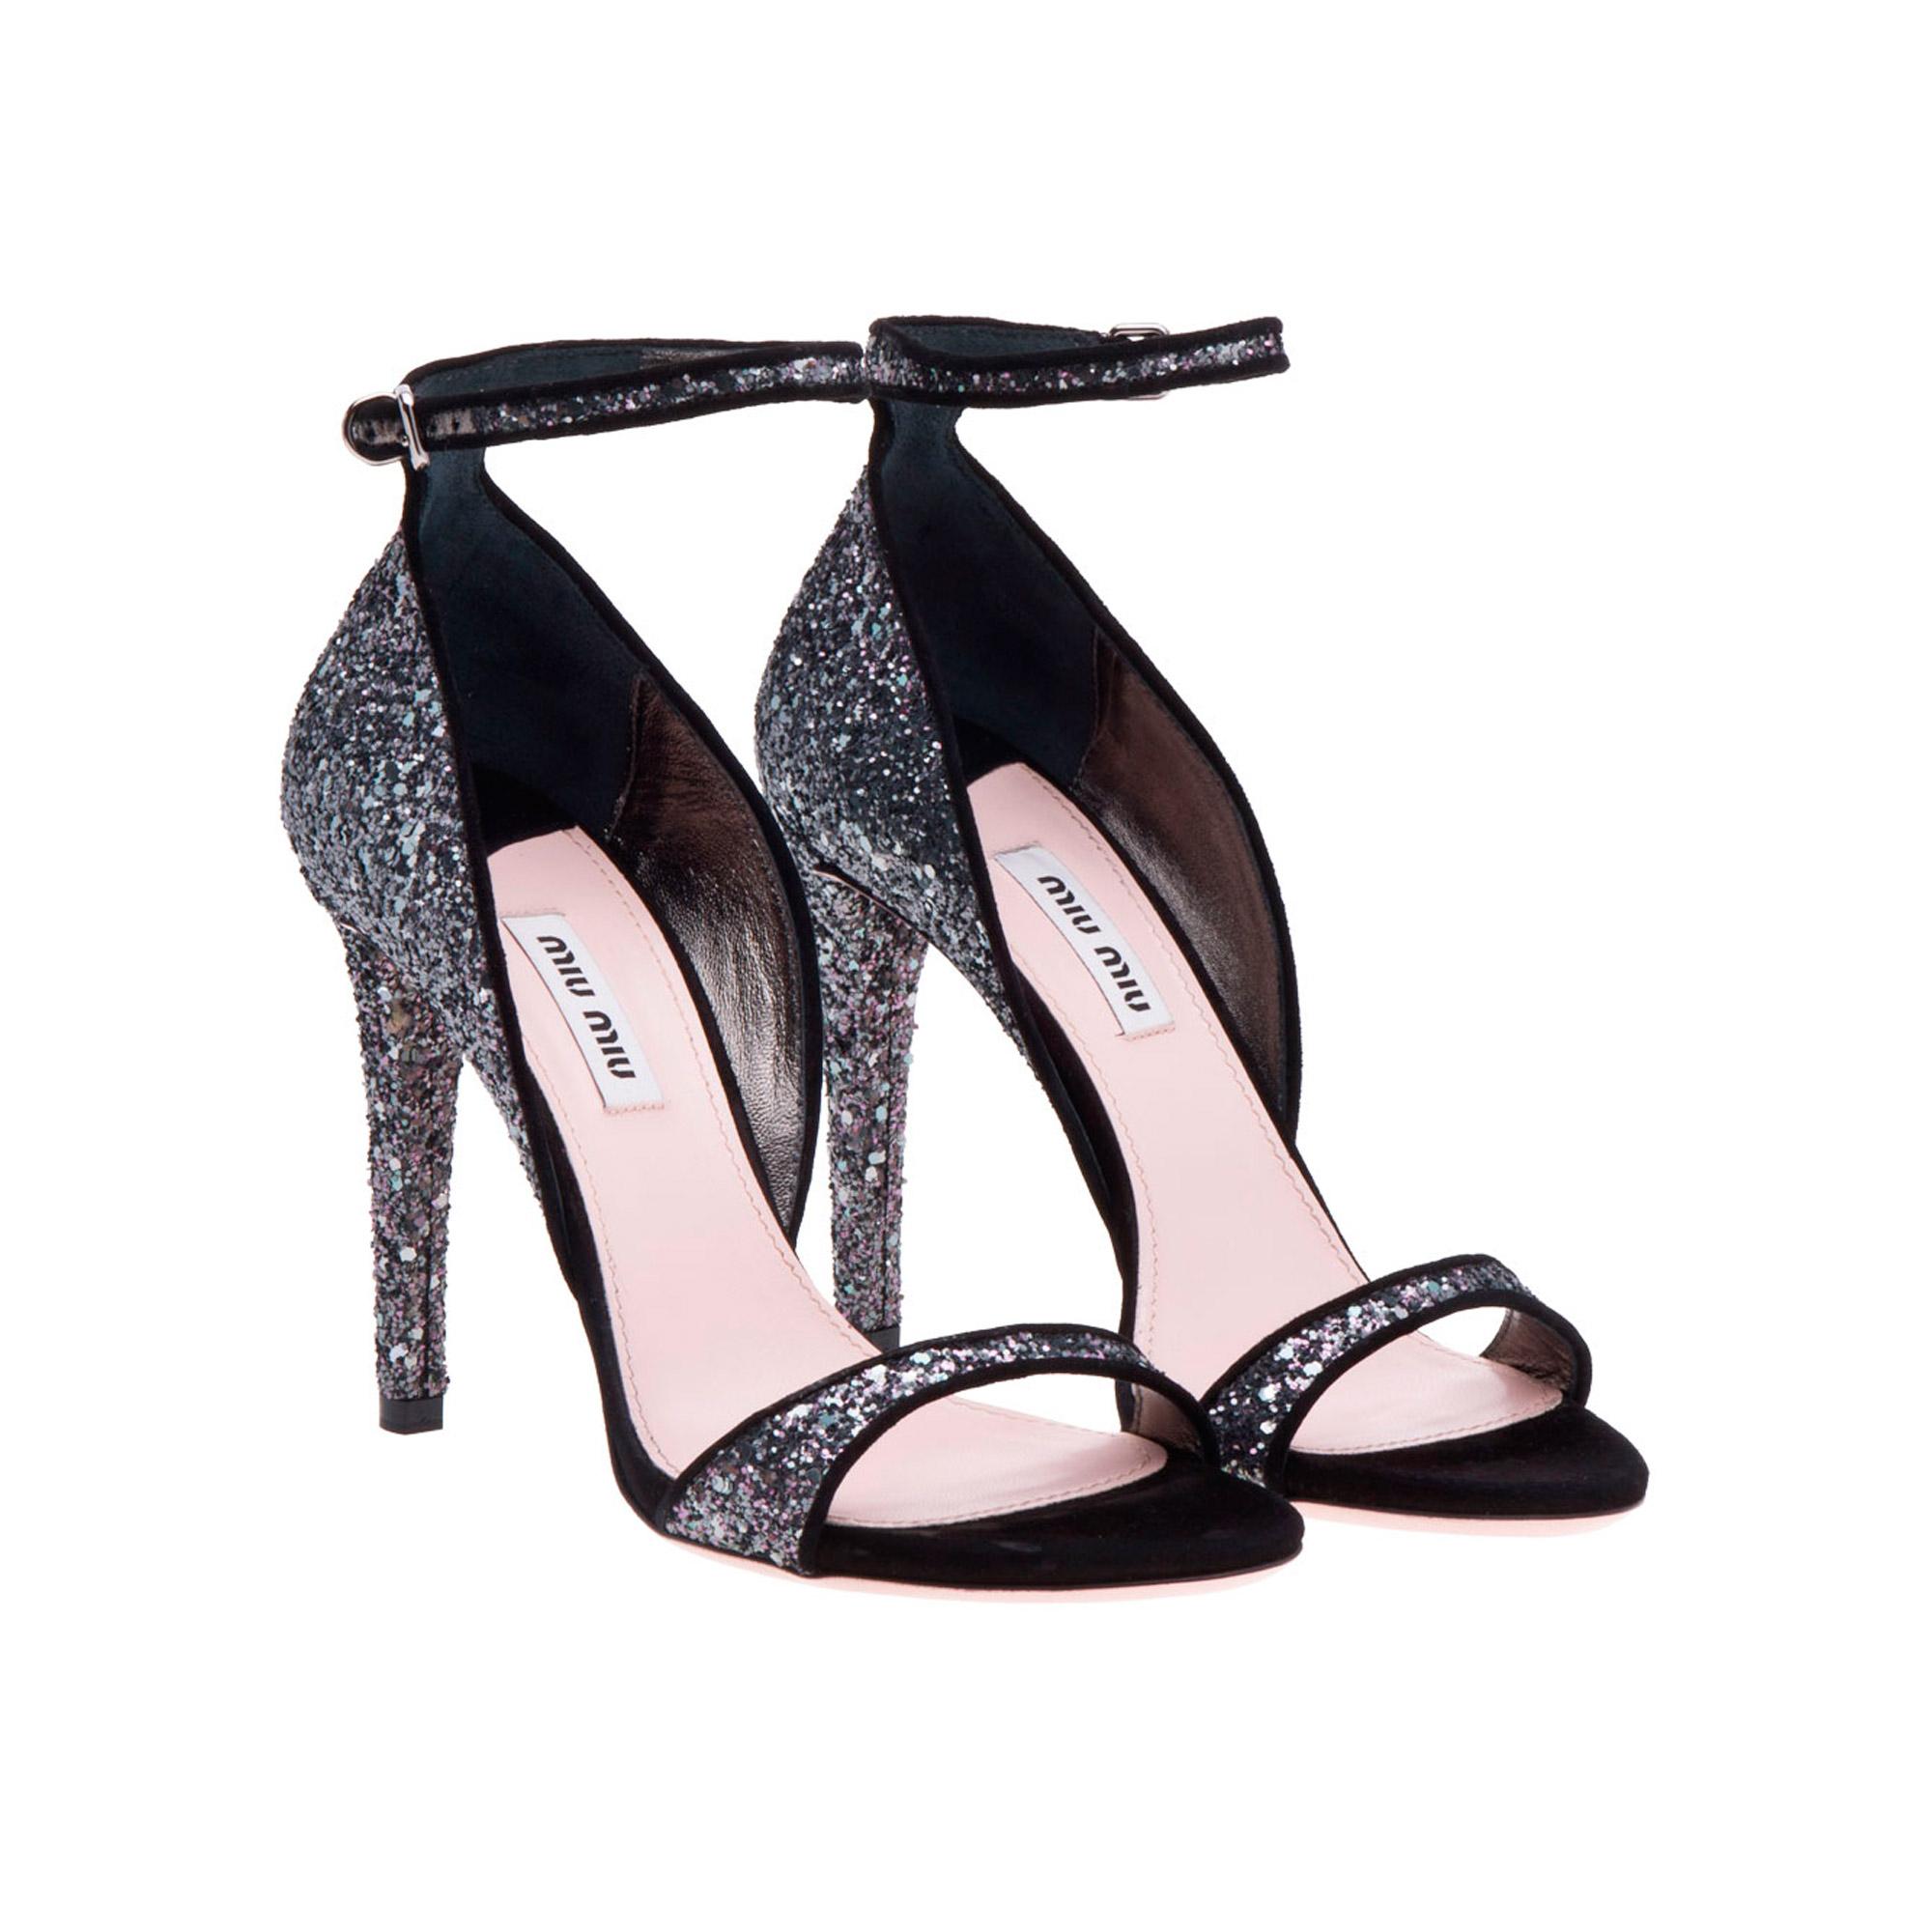 Zapato Mujer Miu Miu